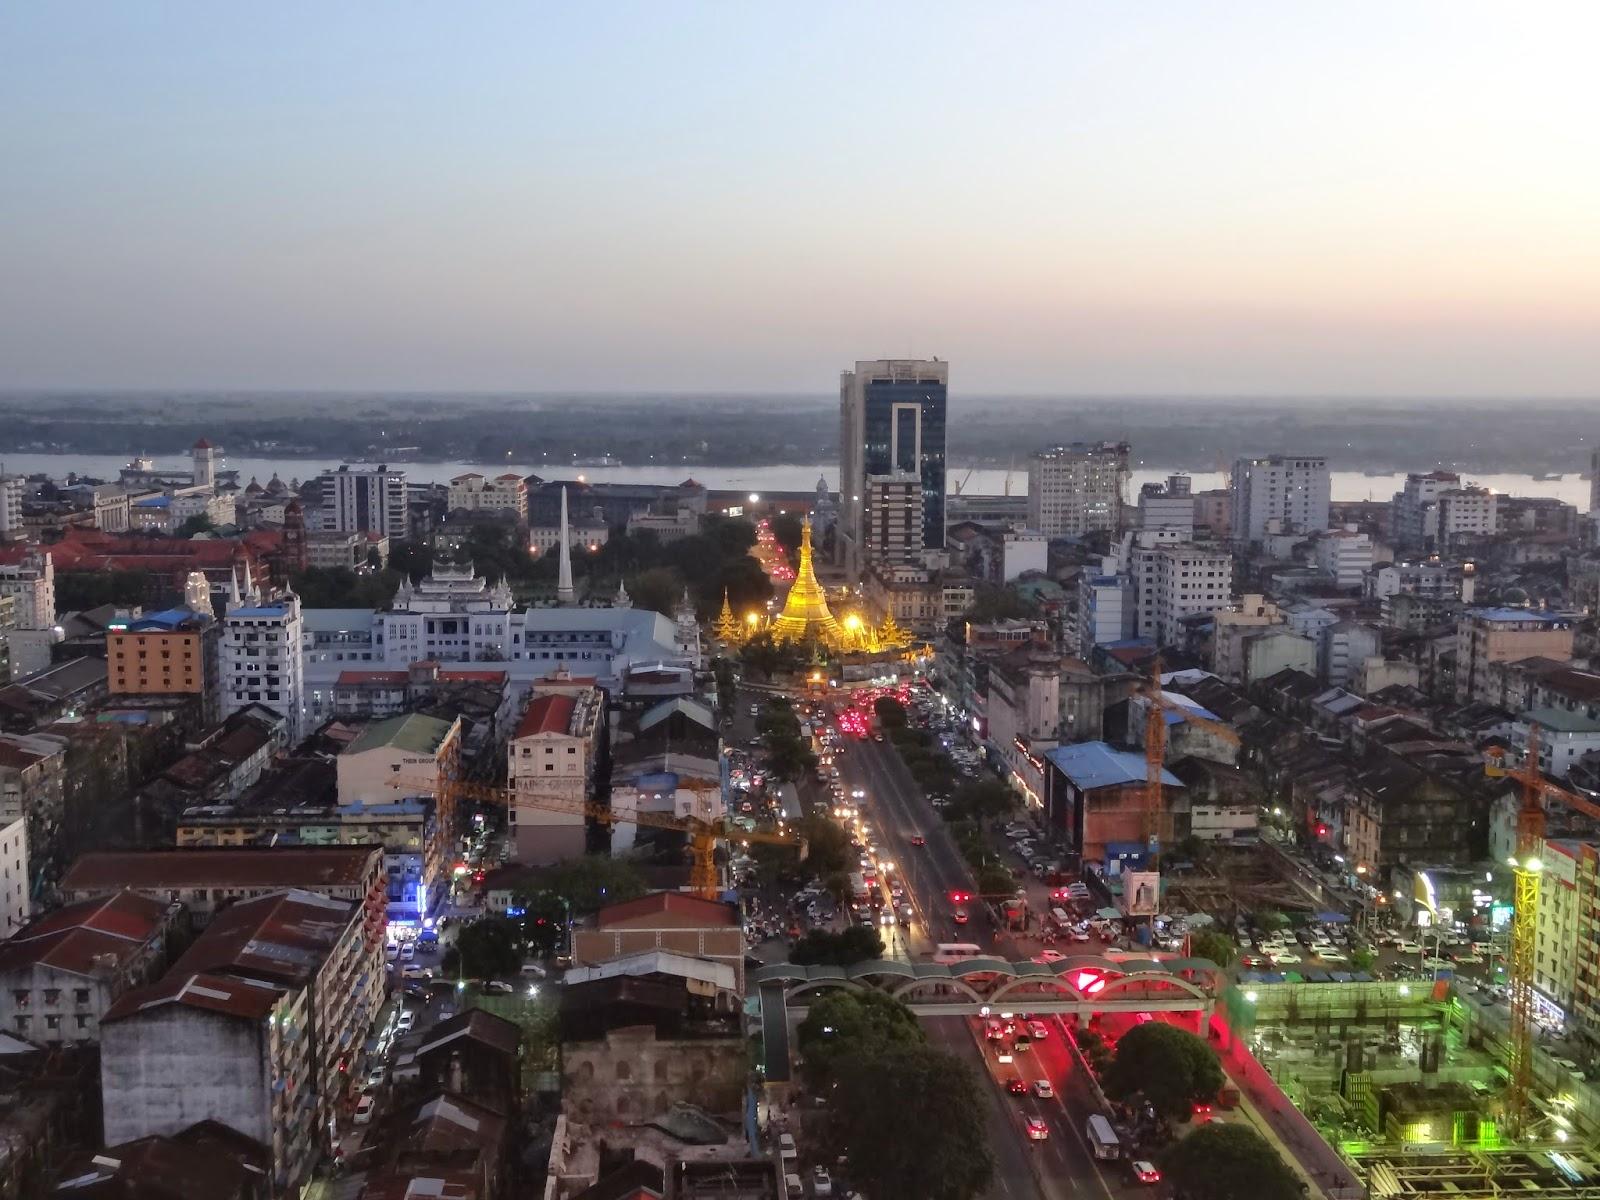 Yangon, economic capital of Burma